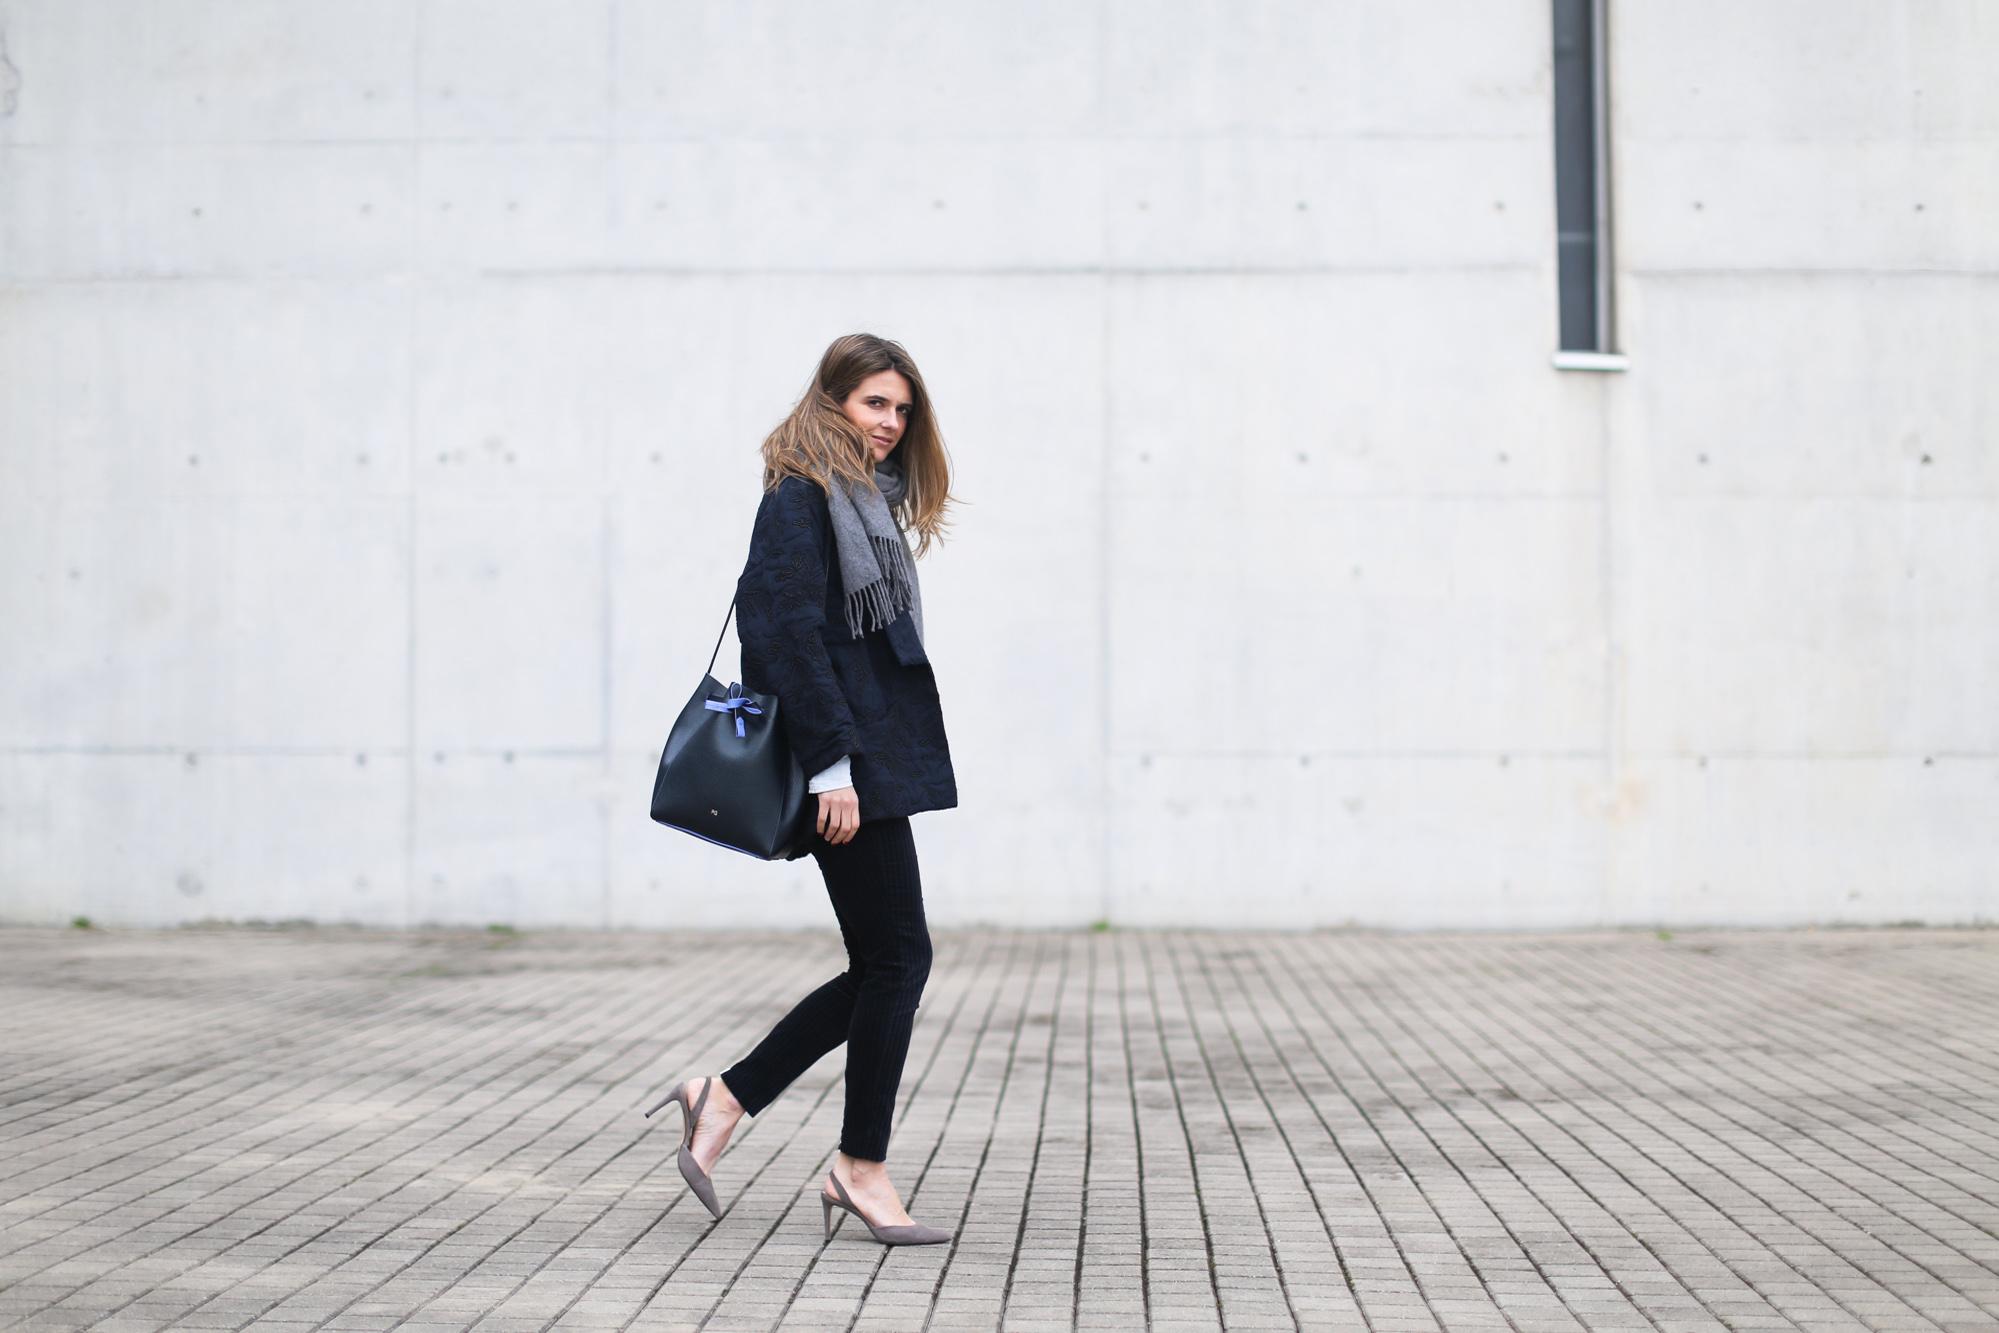 clochet_streetstyle_embroided_kimono_jacket_purificacion_garcia_bucket_bag